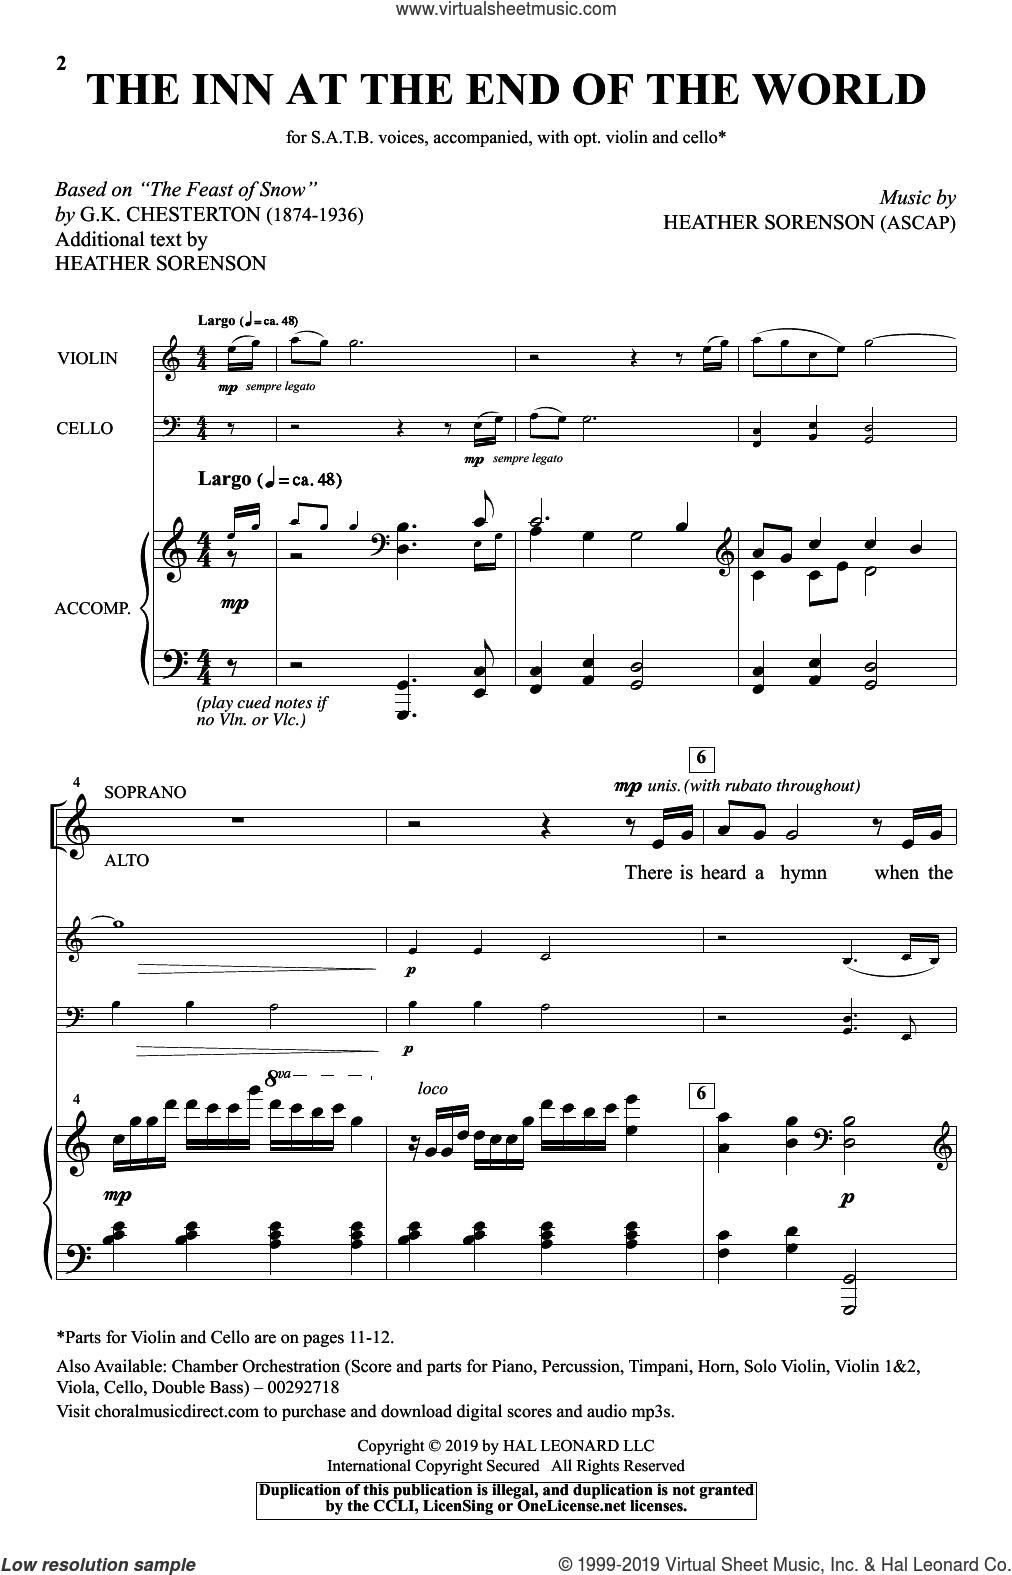 The Inn At The End Of The World (arr. Heather Sorenson) sheet music for choir (SATB: soprano, alto, tenor, bass) by Heather Sorenson and Gilbert Keith Chesterton, intermediate skill level